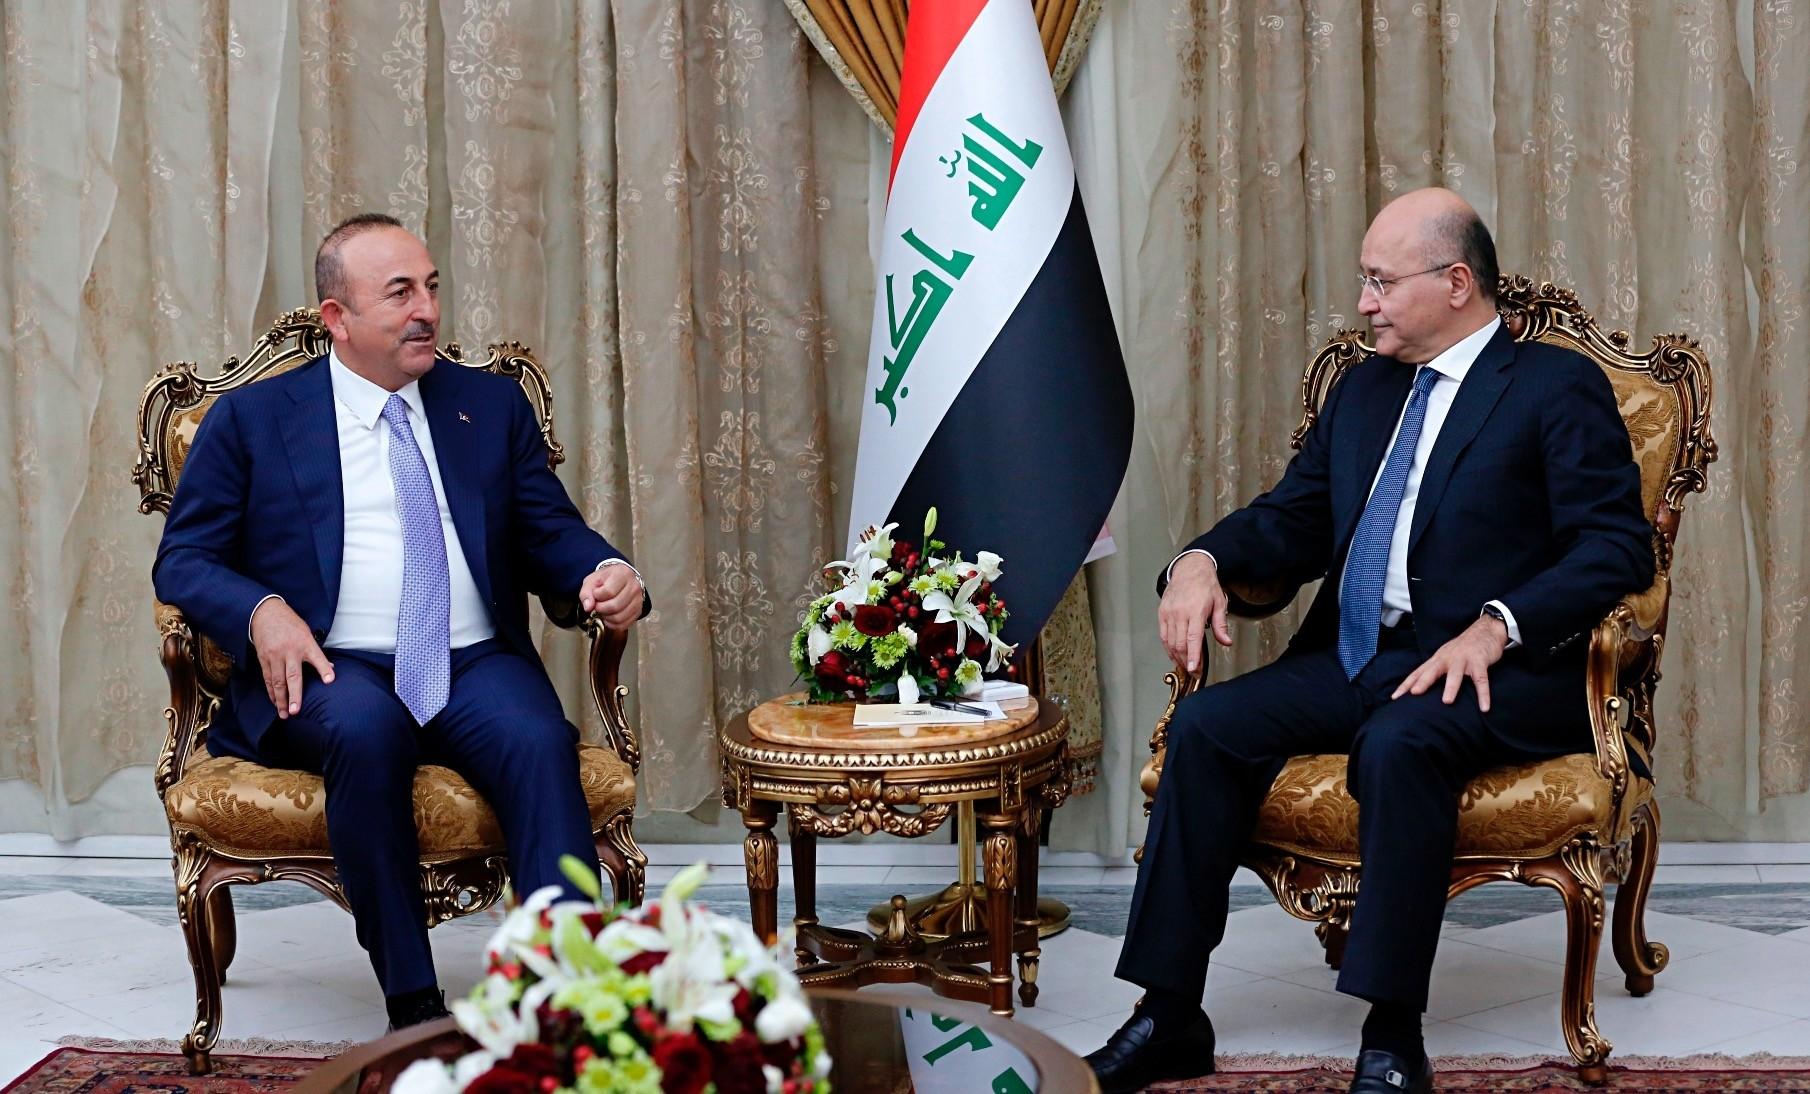 Turkish Foreign Minister Mevlu00fct u00c7avuu015fou011flu (L) meets with Iraqi President Barham Salih in Baghdad, yesterday.